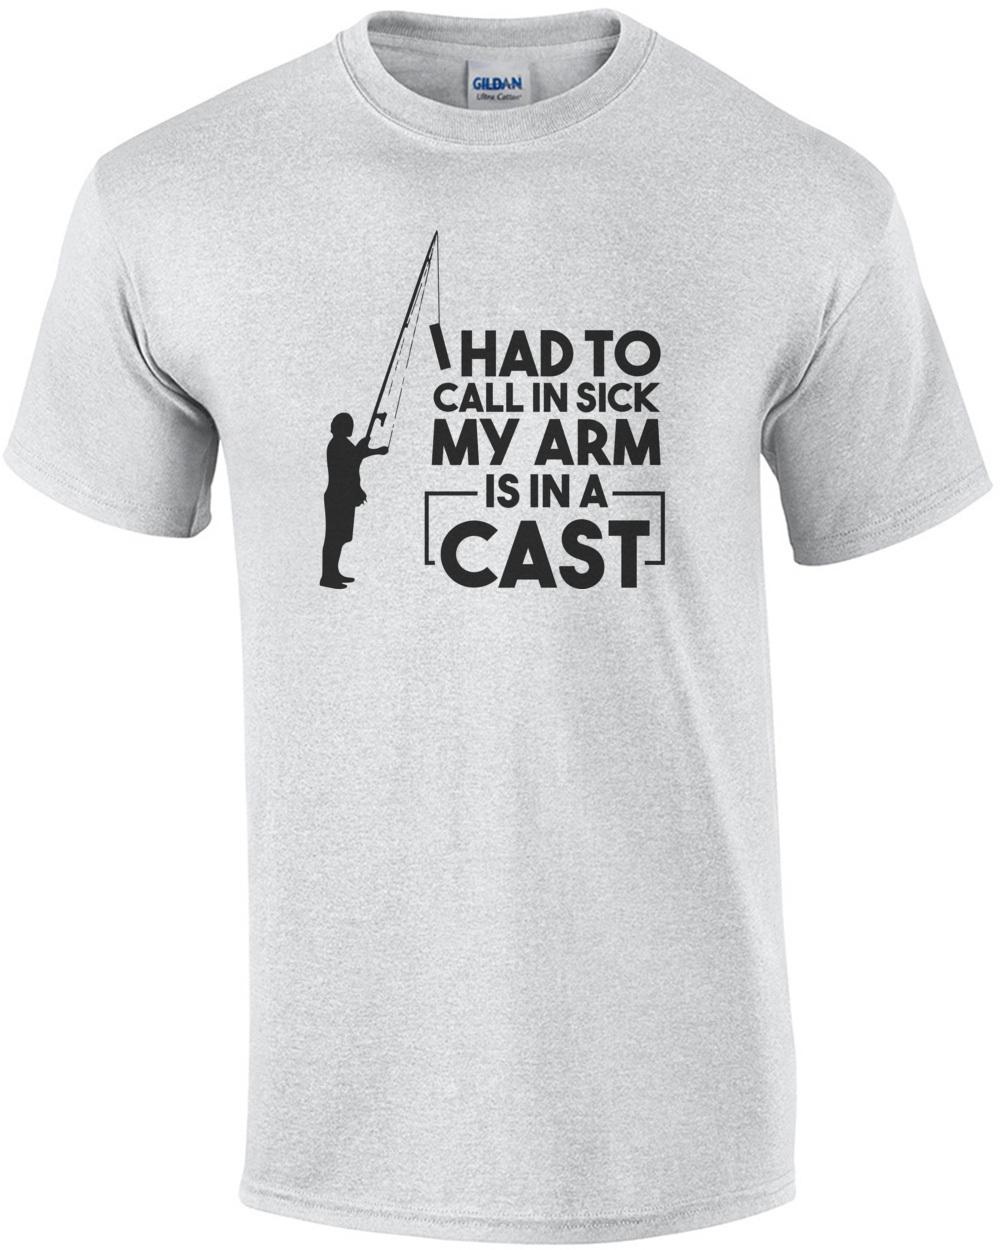 4bafffc3 i-had-to-call-in-sick-my-arm-is-in-a-cast --funny-fishing-tshirt-mens-regular-ash.jpg